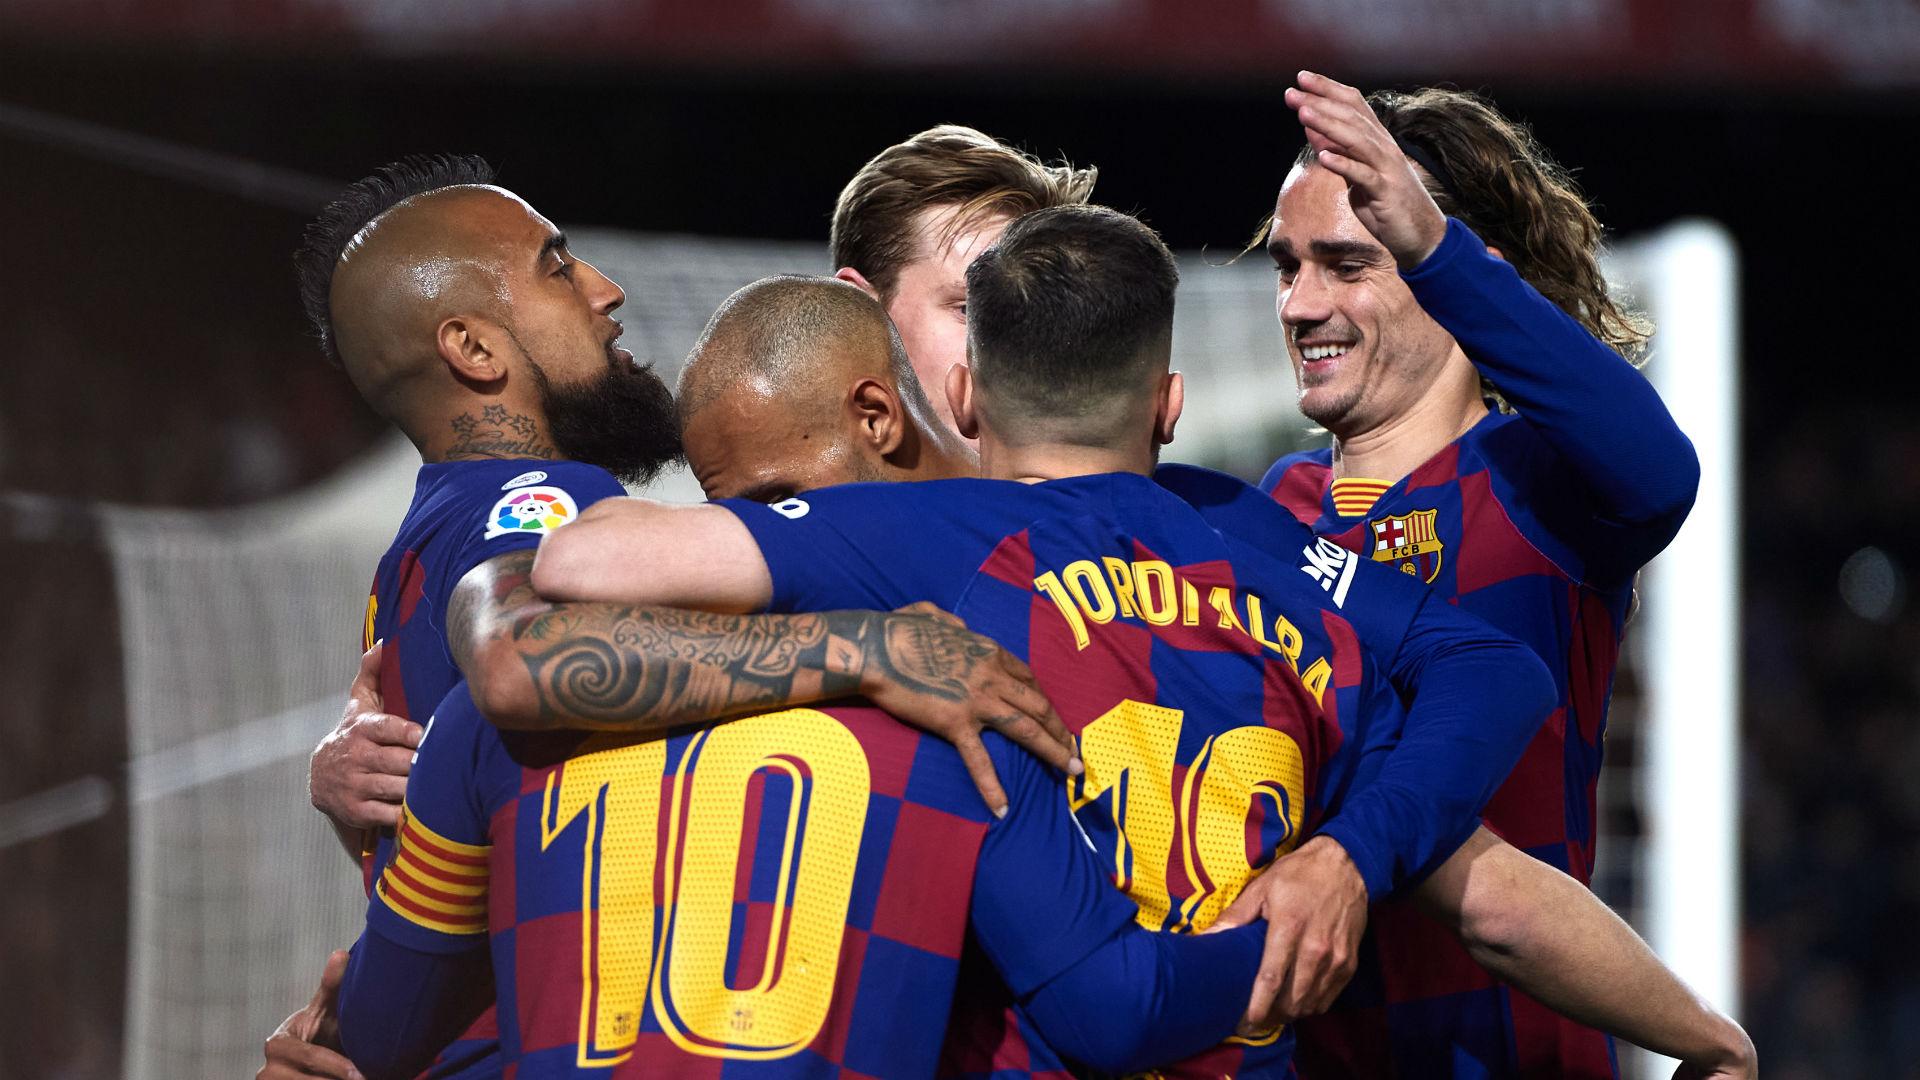 Coronavirus: LaLiga confirms Seville derby to restart campaign, season to finish on July 19